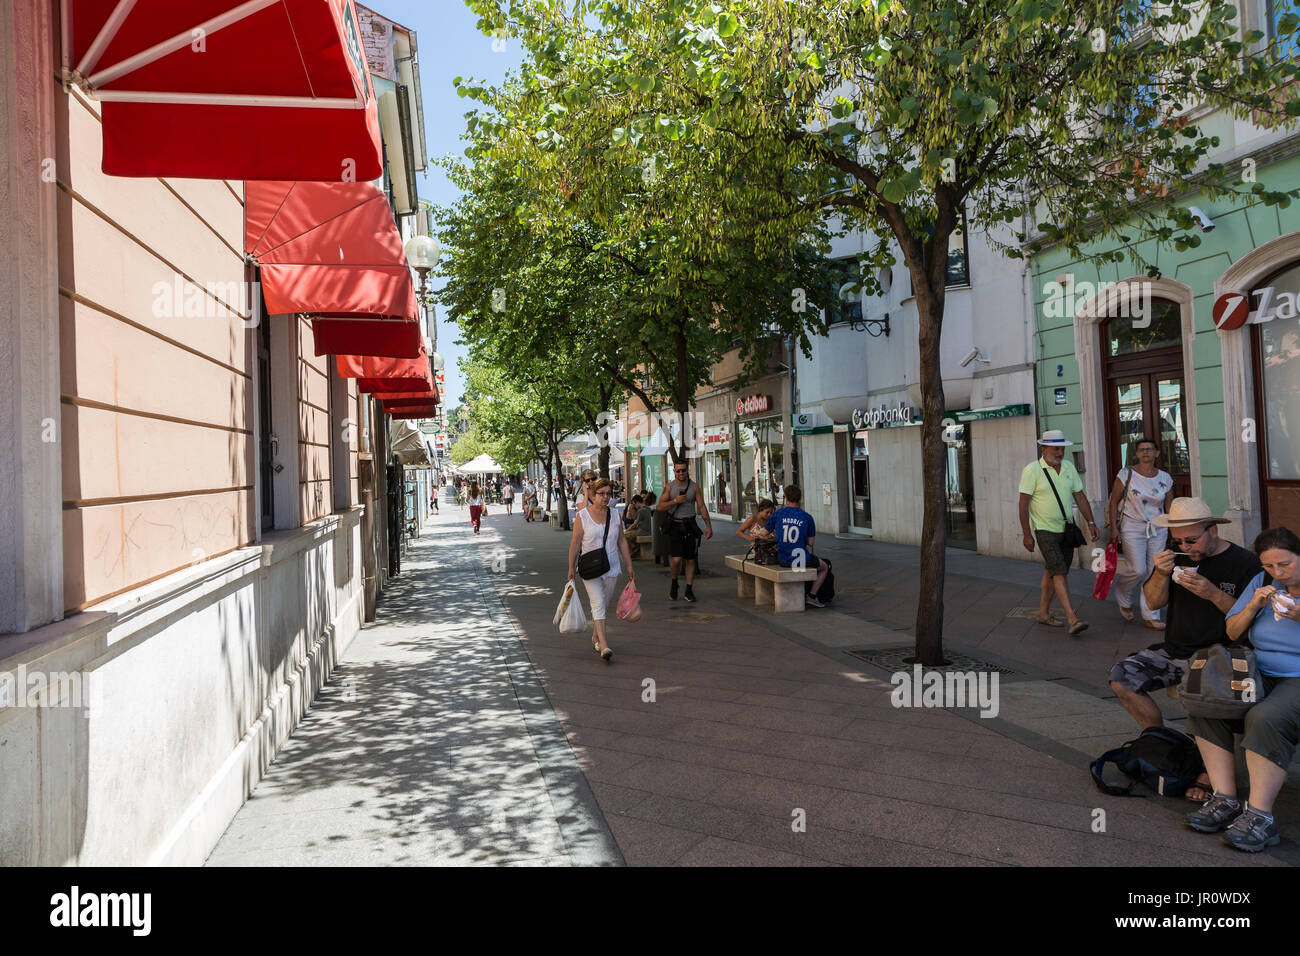 Shopping street in Pula, Croatia - Stock Image